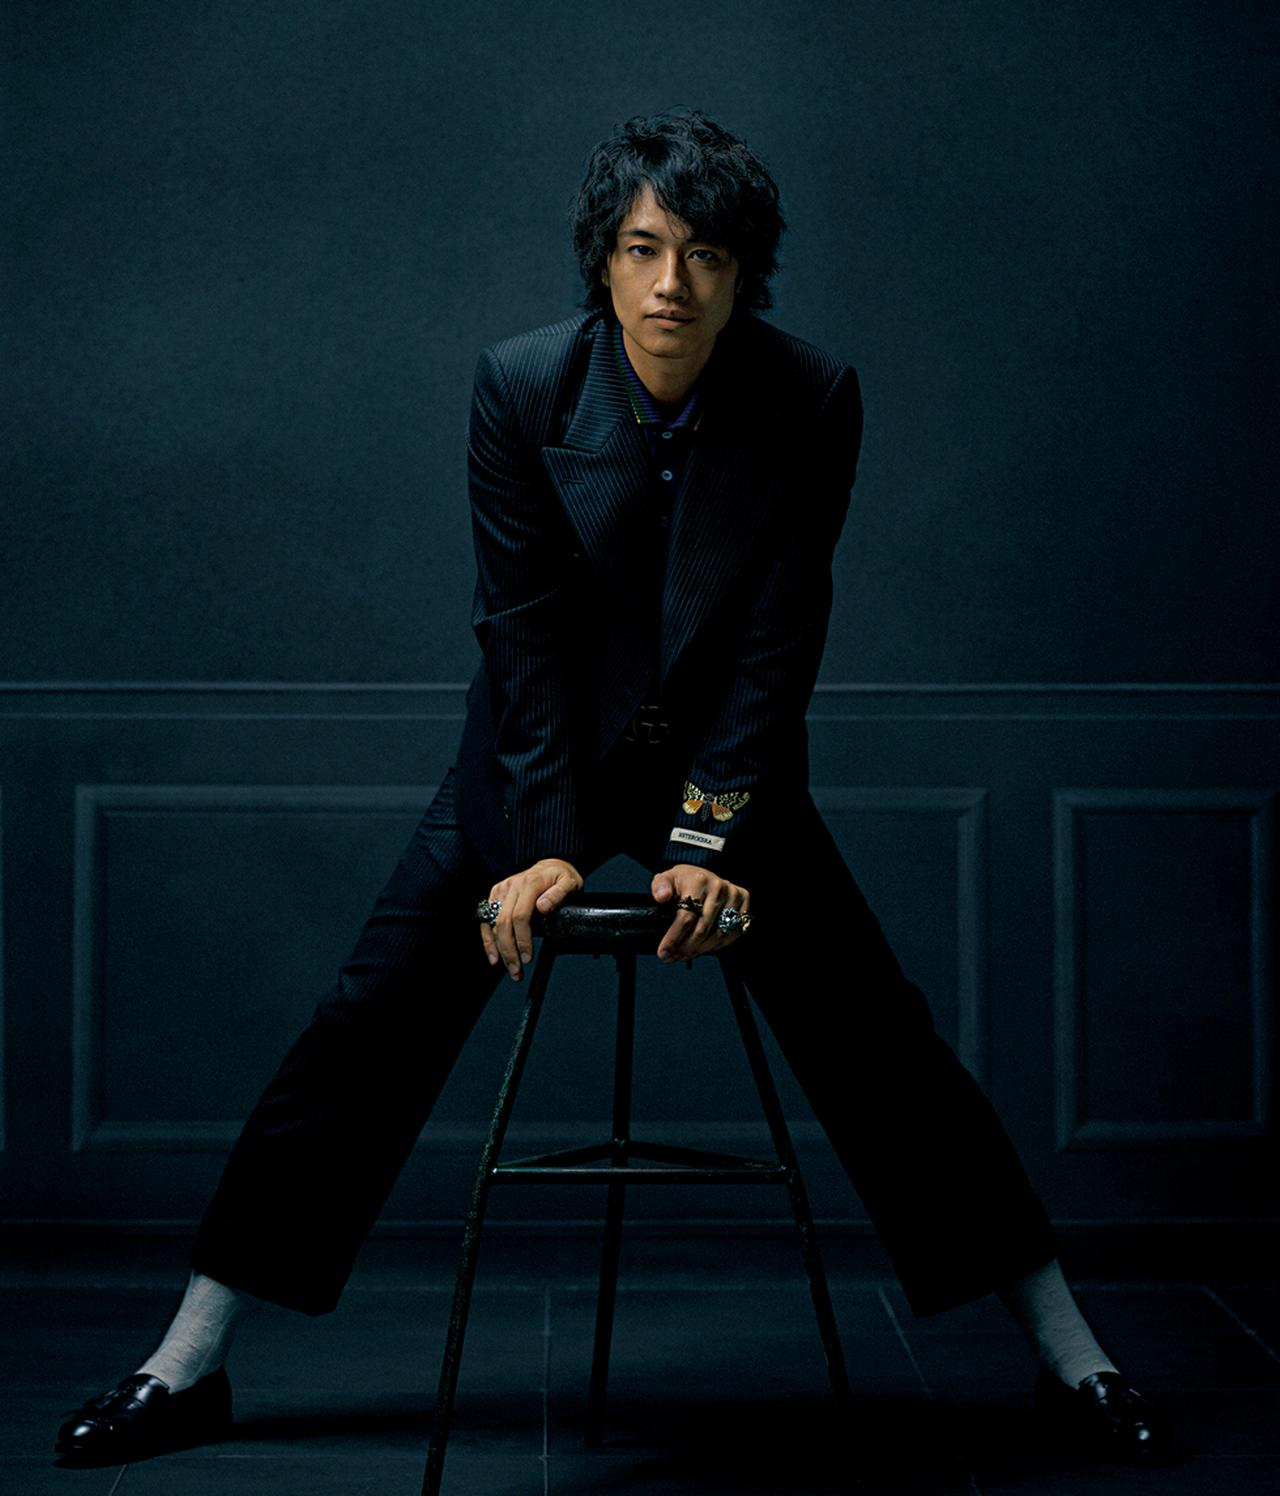 Images : 3番目の画像 - 「斎藤 工、かく纏いし」のアルバム - T JAPAN:The New York Times Style Magazine 公式サイト